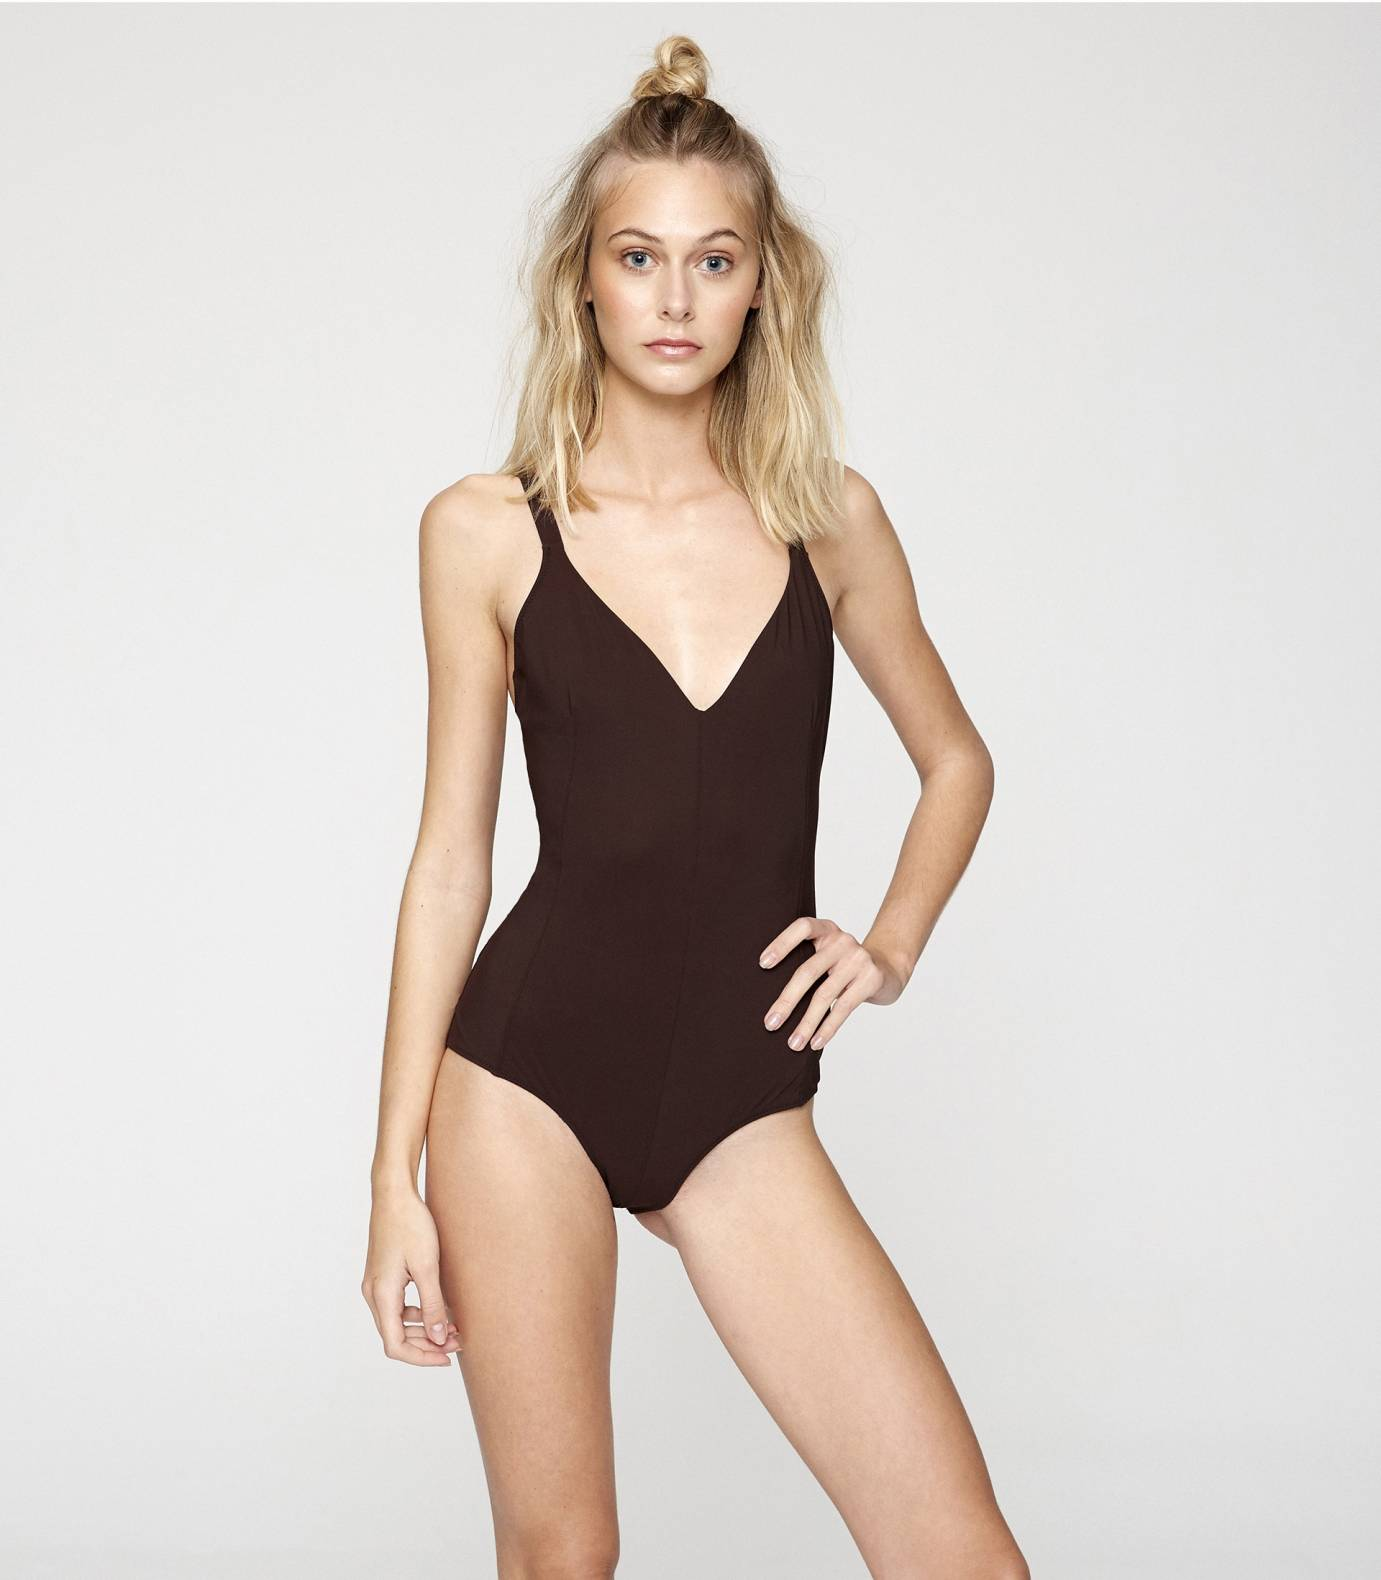 Uni Bt One Piece Swimsuit